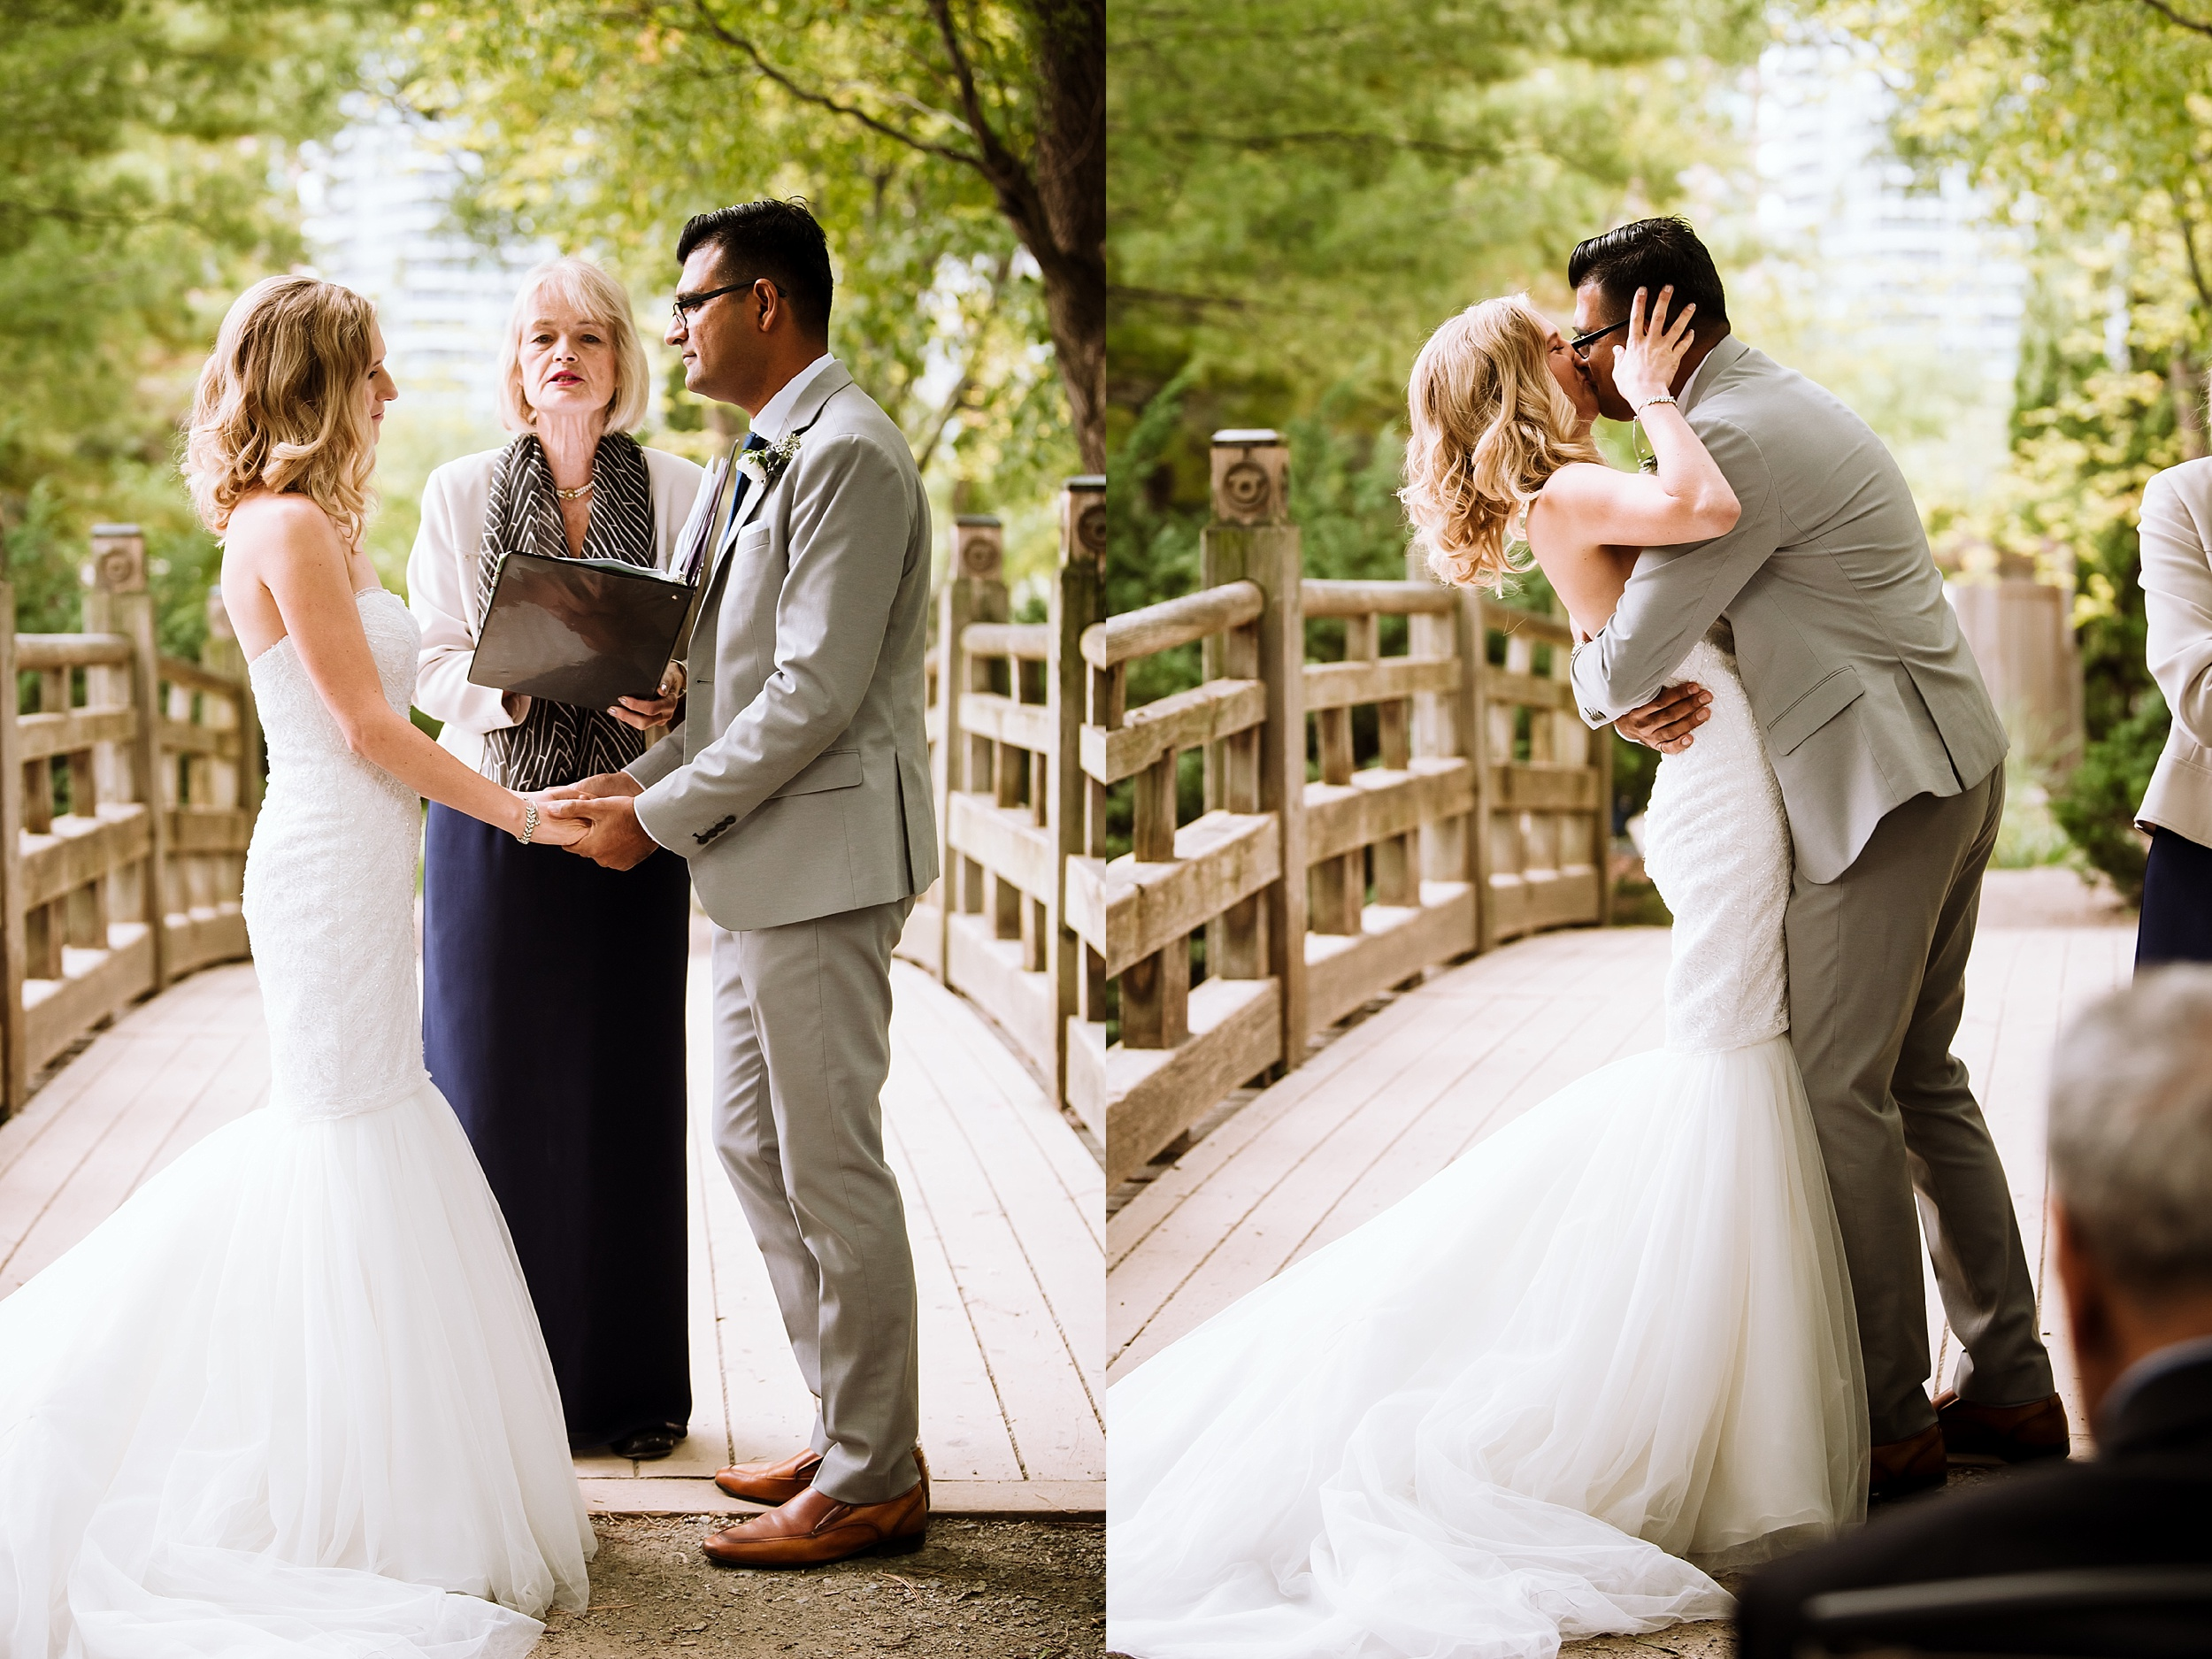 Kariya_Park_Wedding_Shoot_Toronto_Photographer_0055.jpg